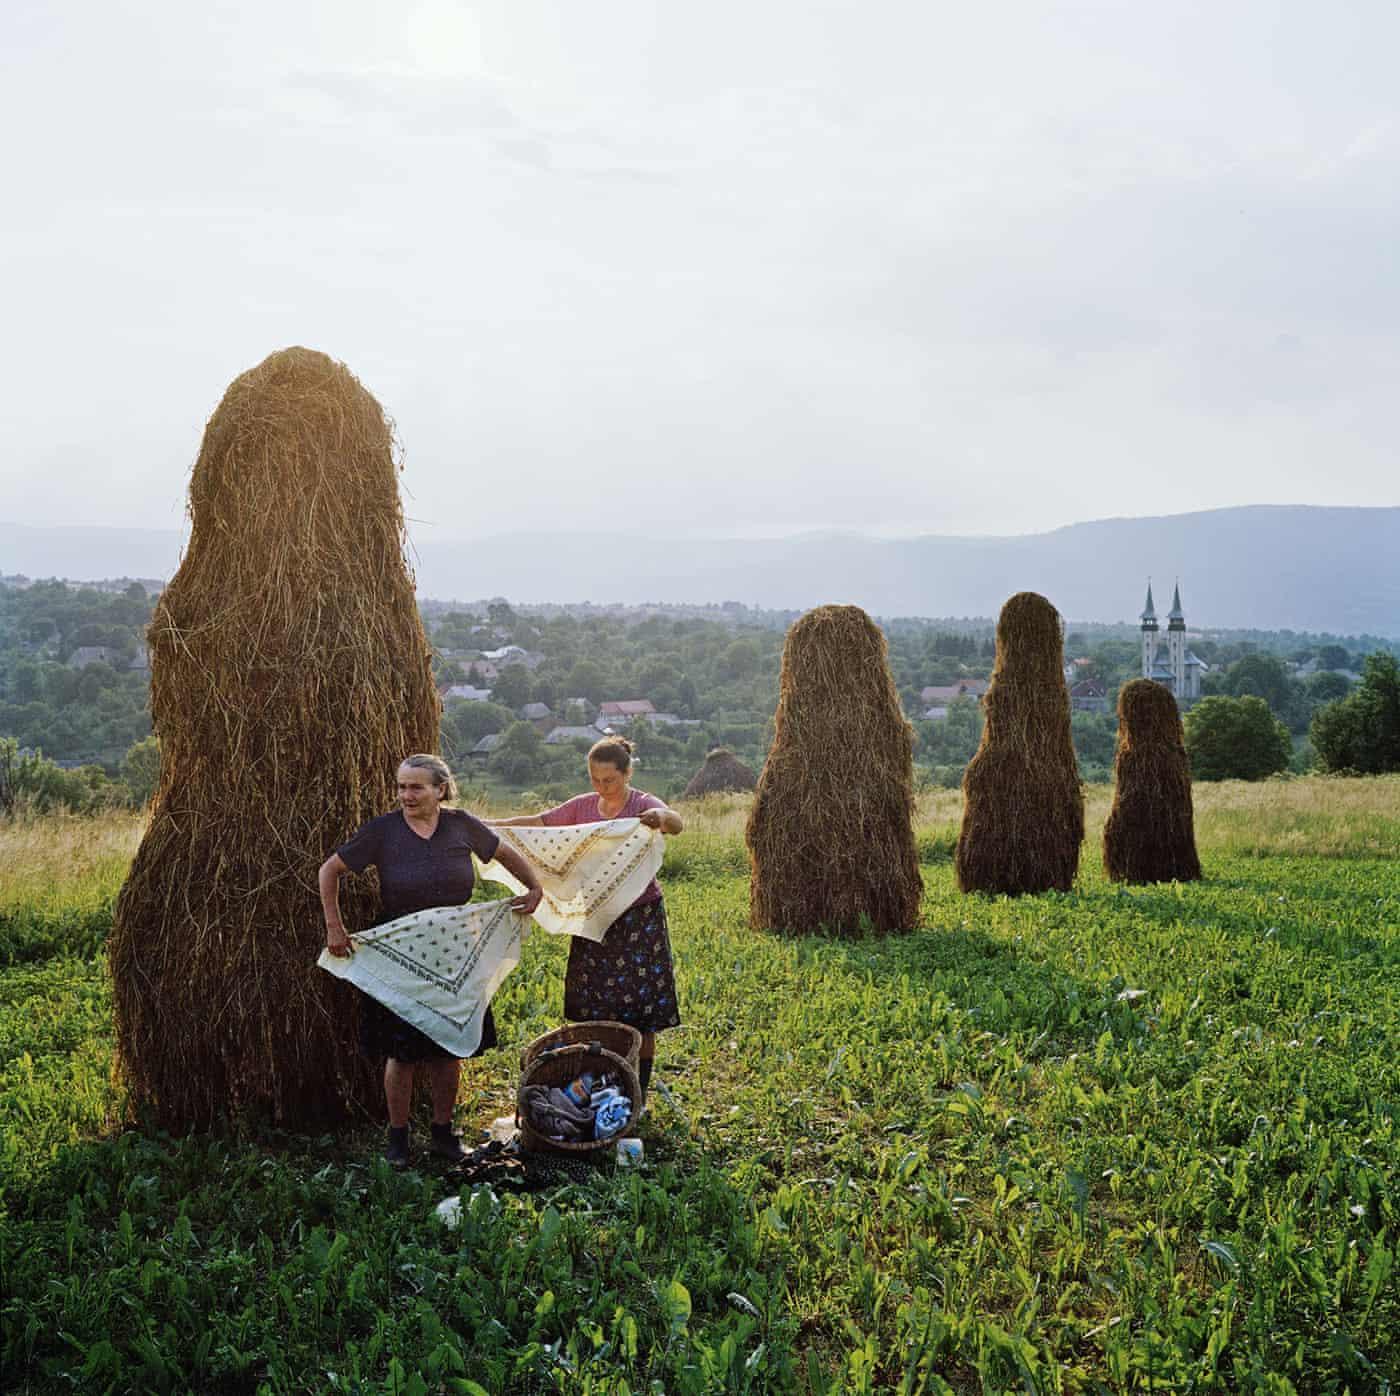 My best shot: Rena Effendi on haymaking in Transylvania